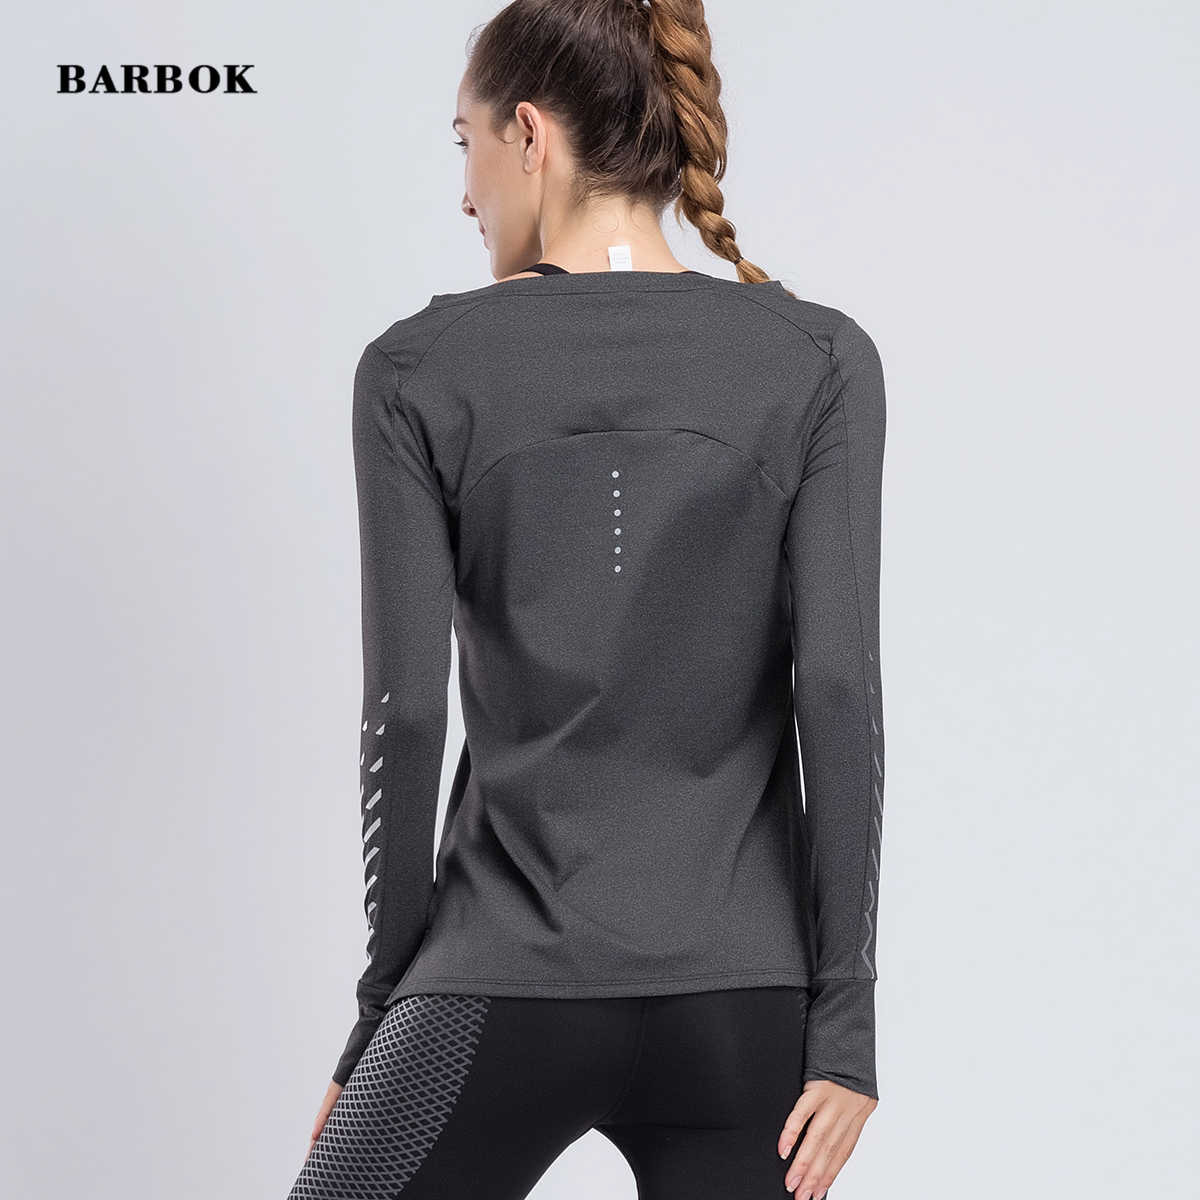 BARBOK נשים כושר יוגה חולצות יוגה חולצות ארוך שרוול אימון כושר ריצת ספורט חולצות אימון יוגה סתיו ספורט